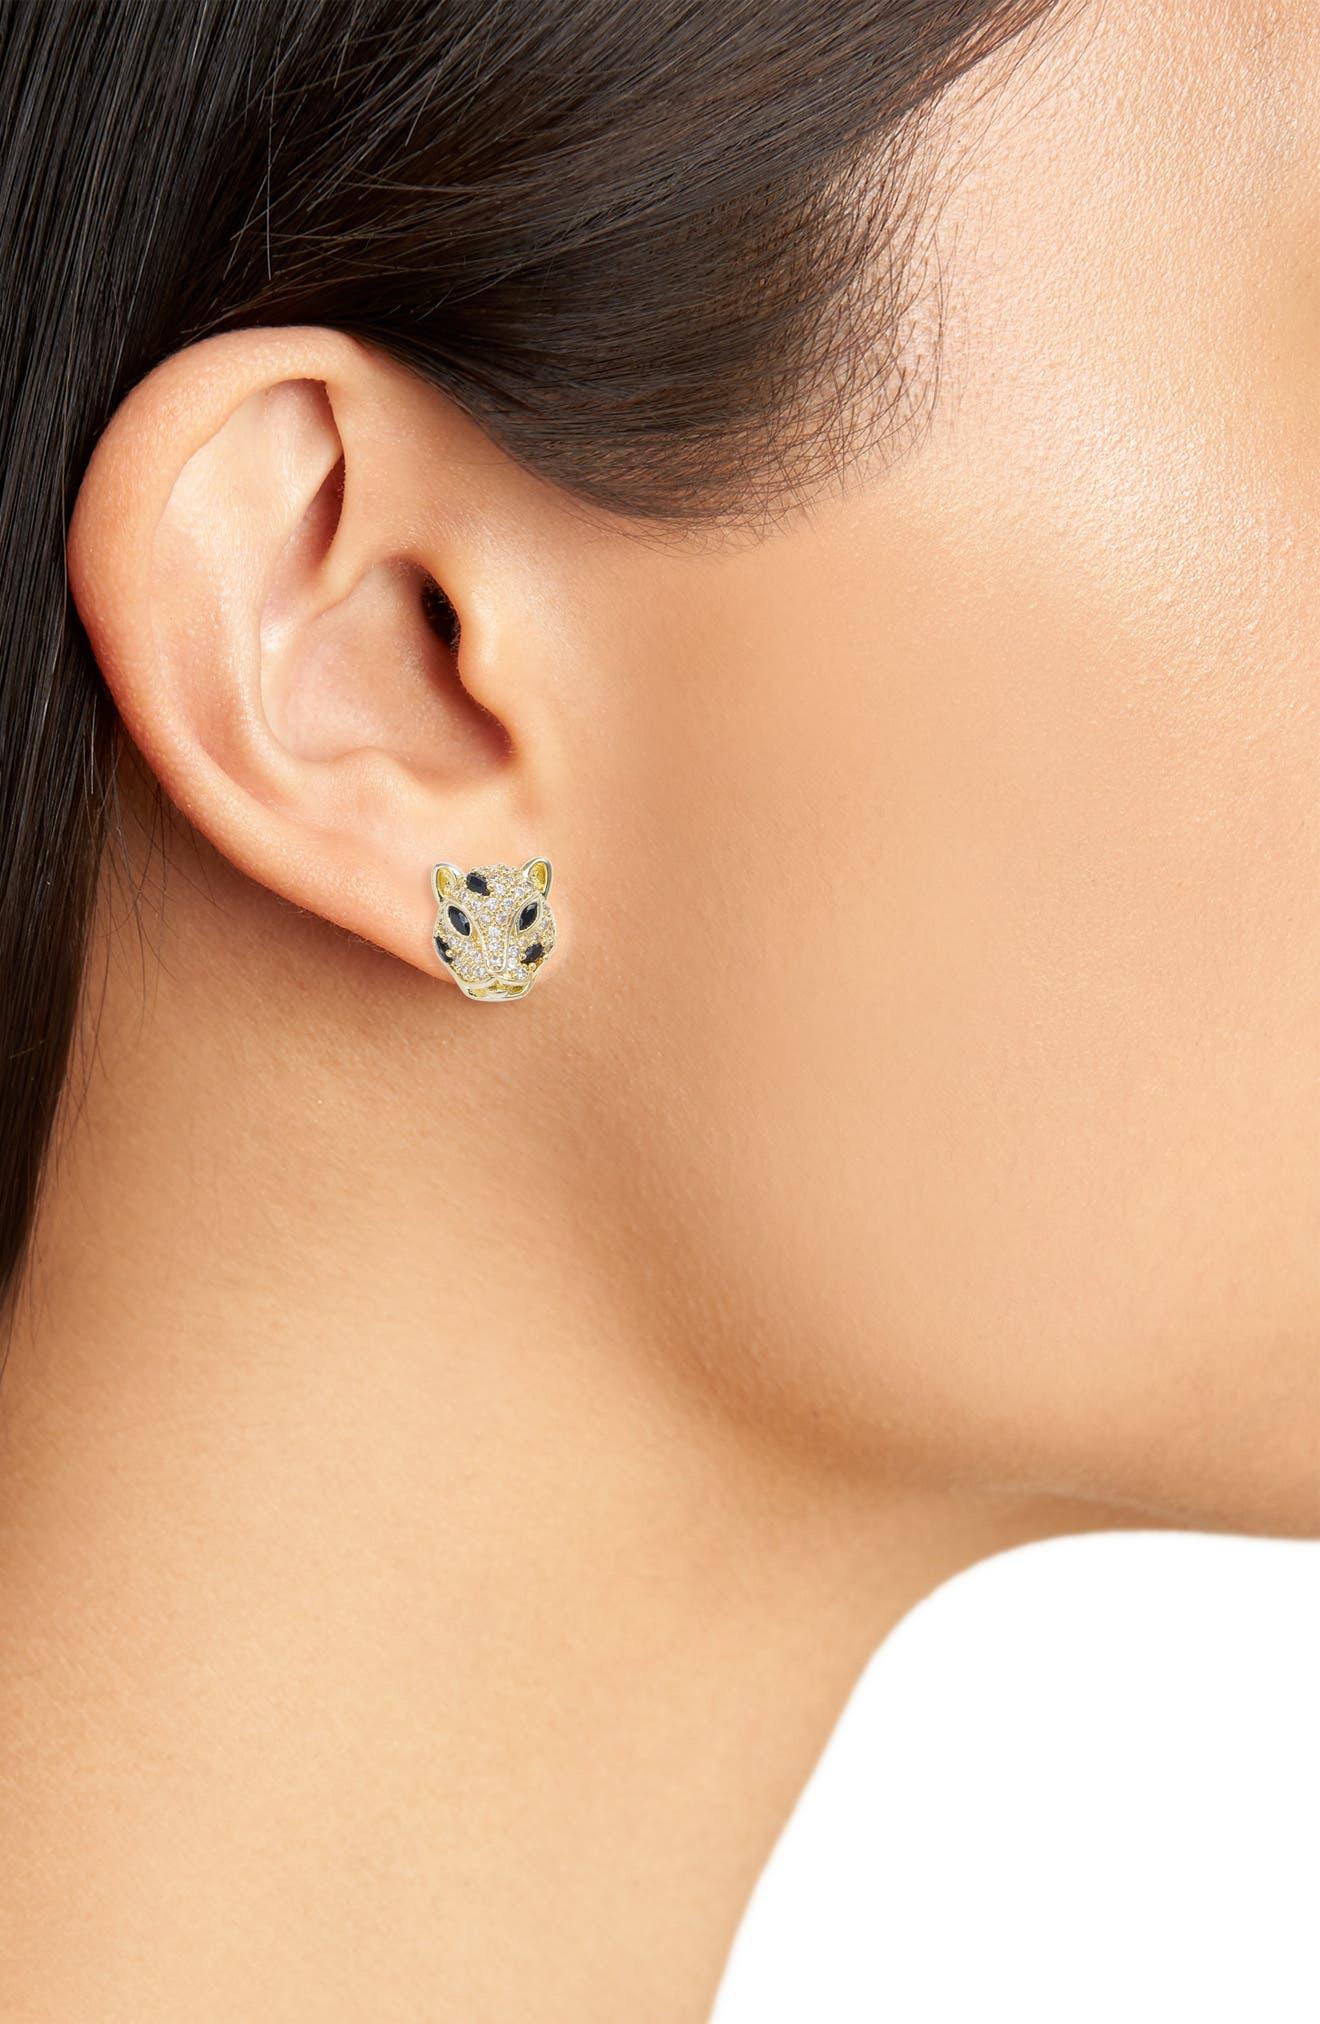 Baby Jaguar Stud Earrings,                             Alternate thumbnail 2, color,                             GOLD AND WHITE CZ